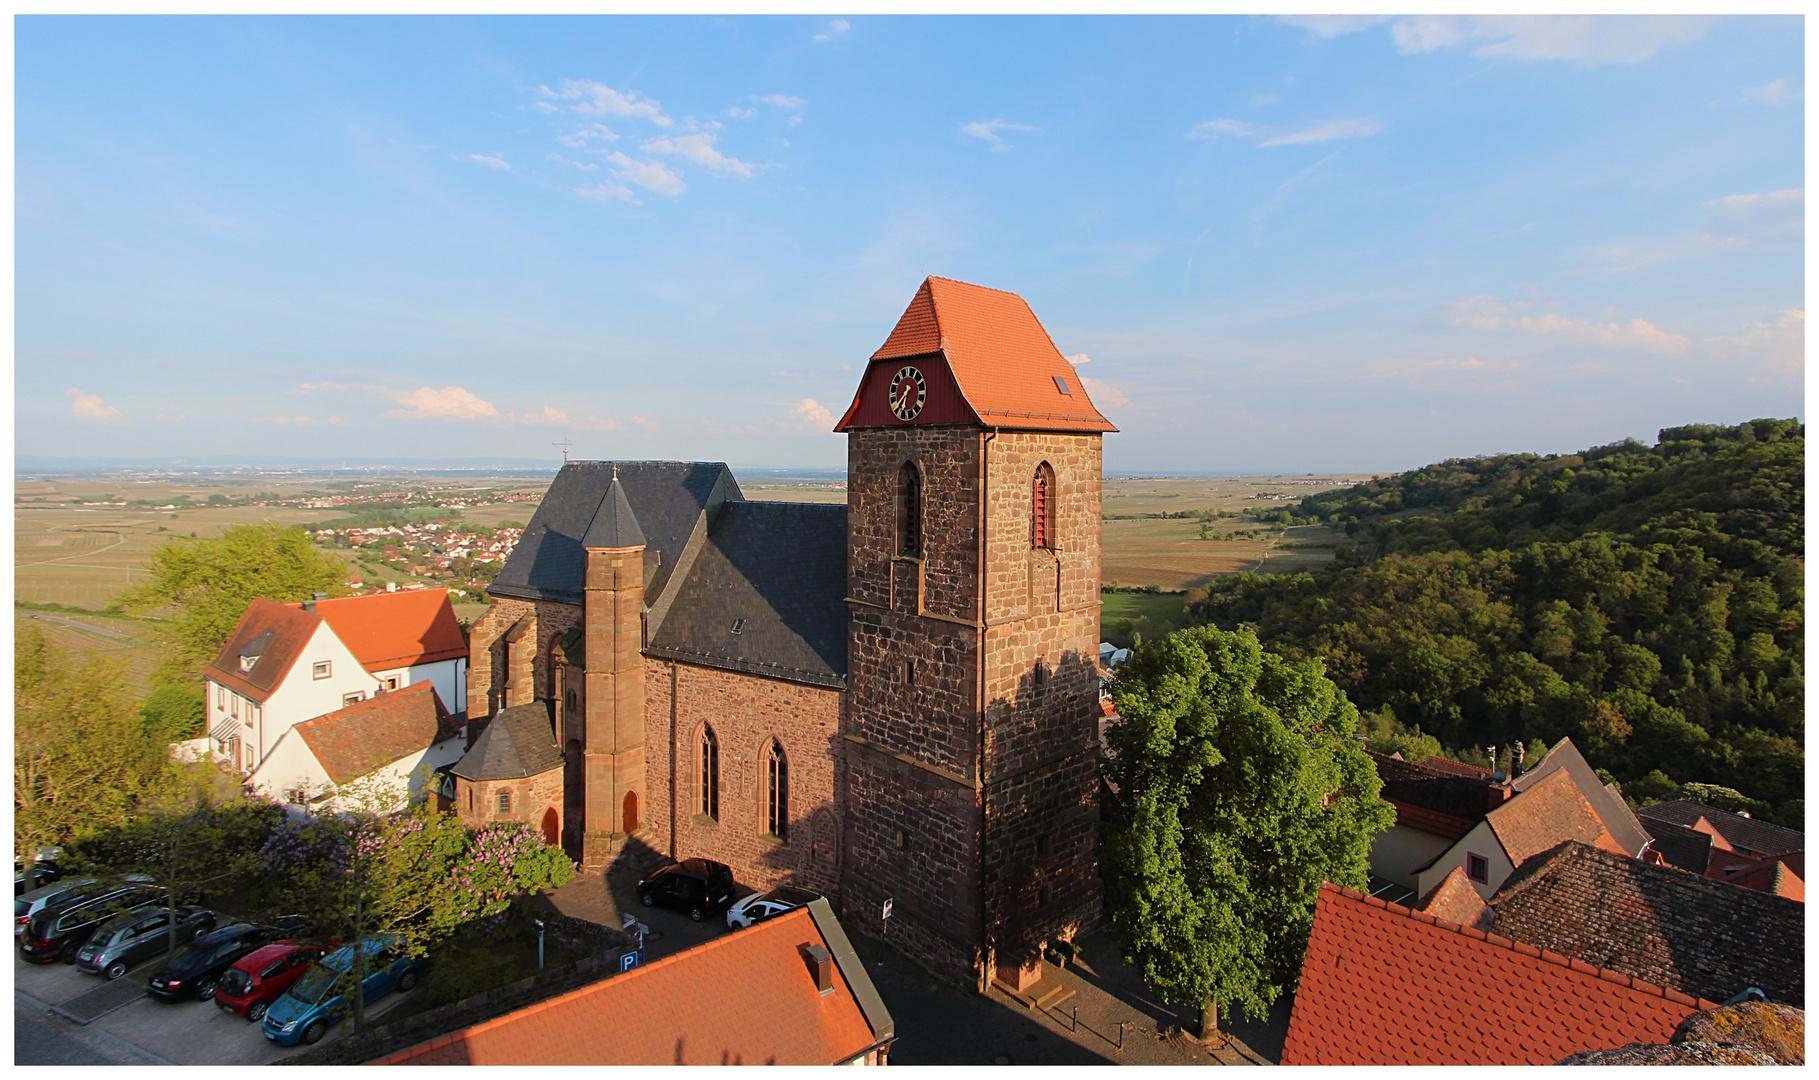 St. Nikolaus-Kirche in Neuleiningen